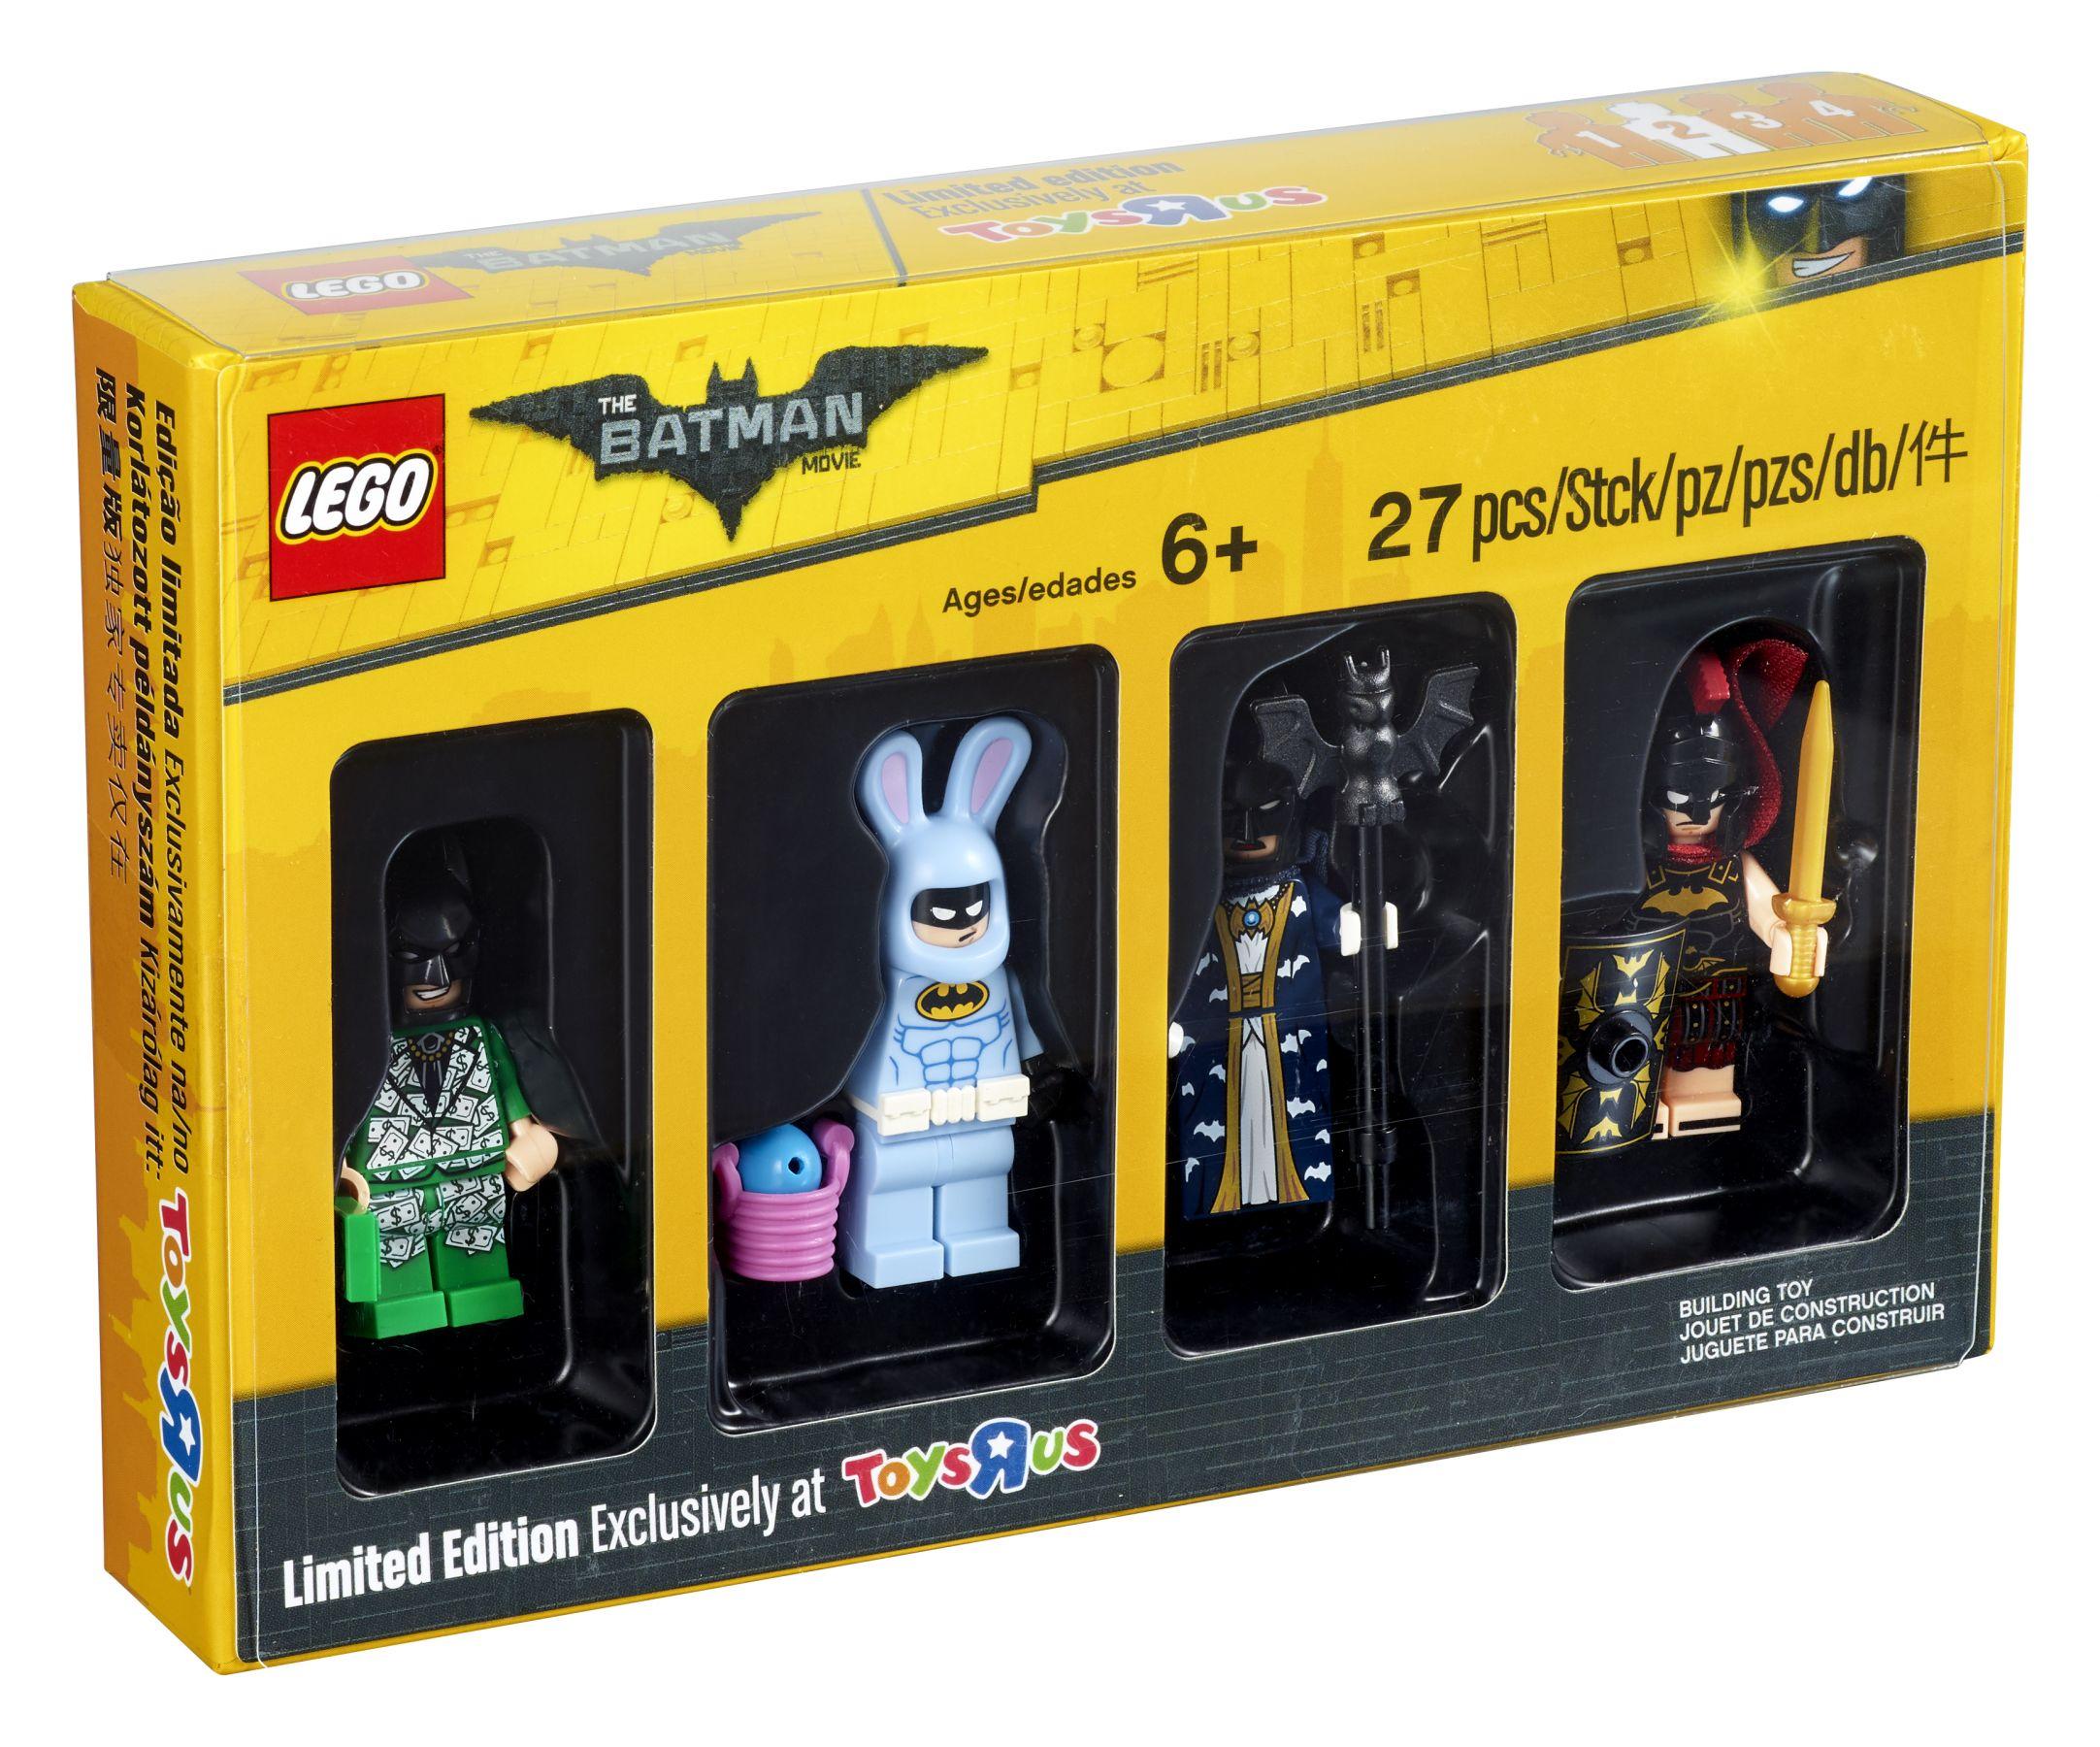 Toys'R'Us Bricktober 2017 The LEGO Batman Movie 5004939 Minifiguren Set